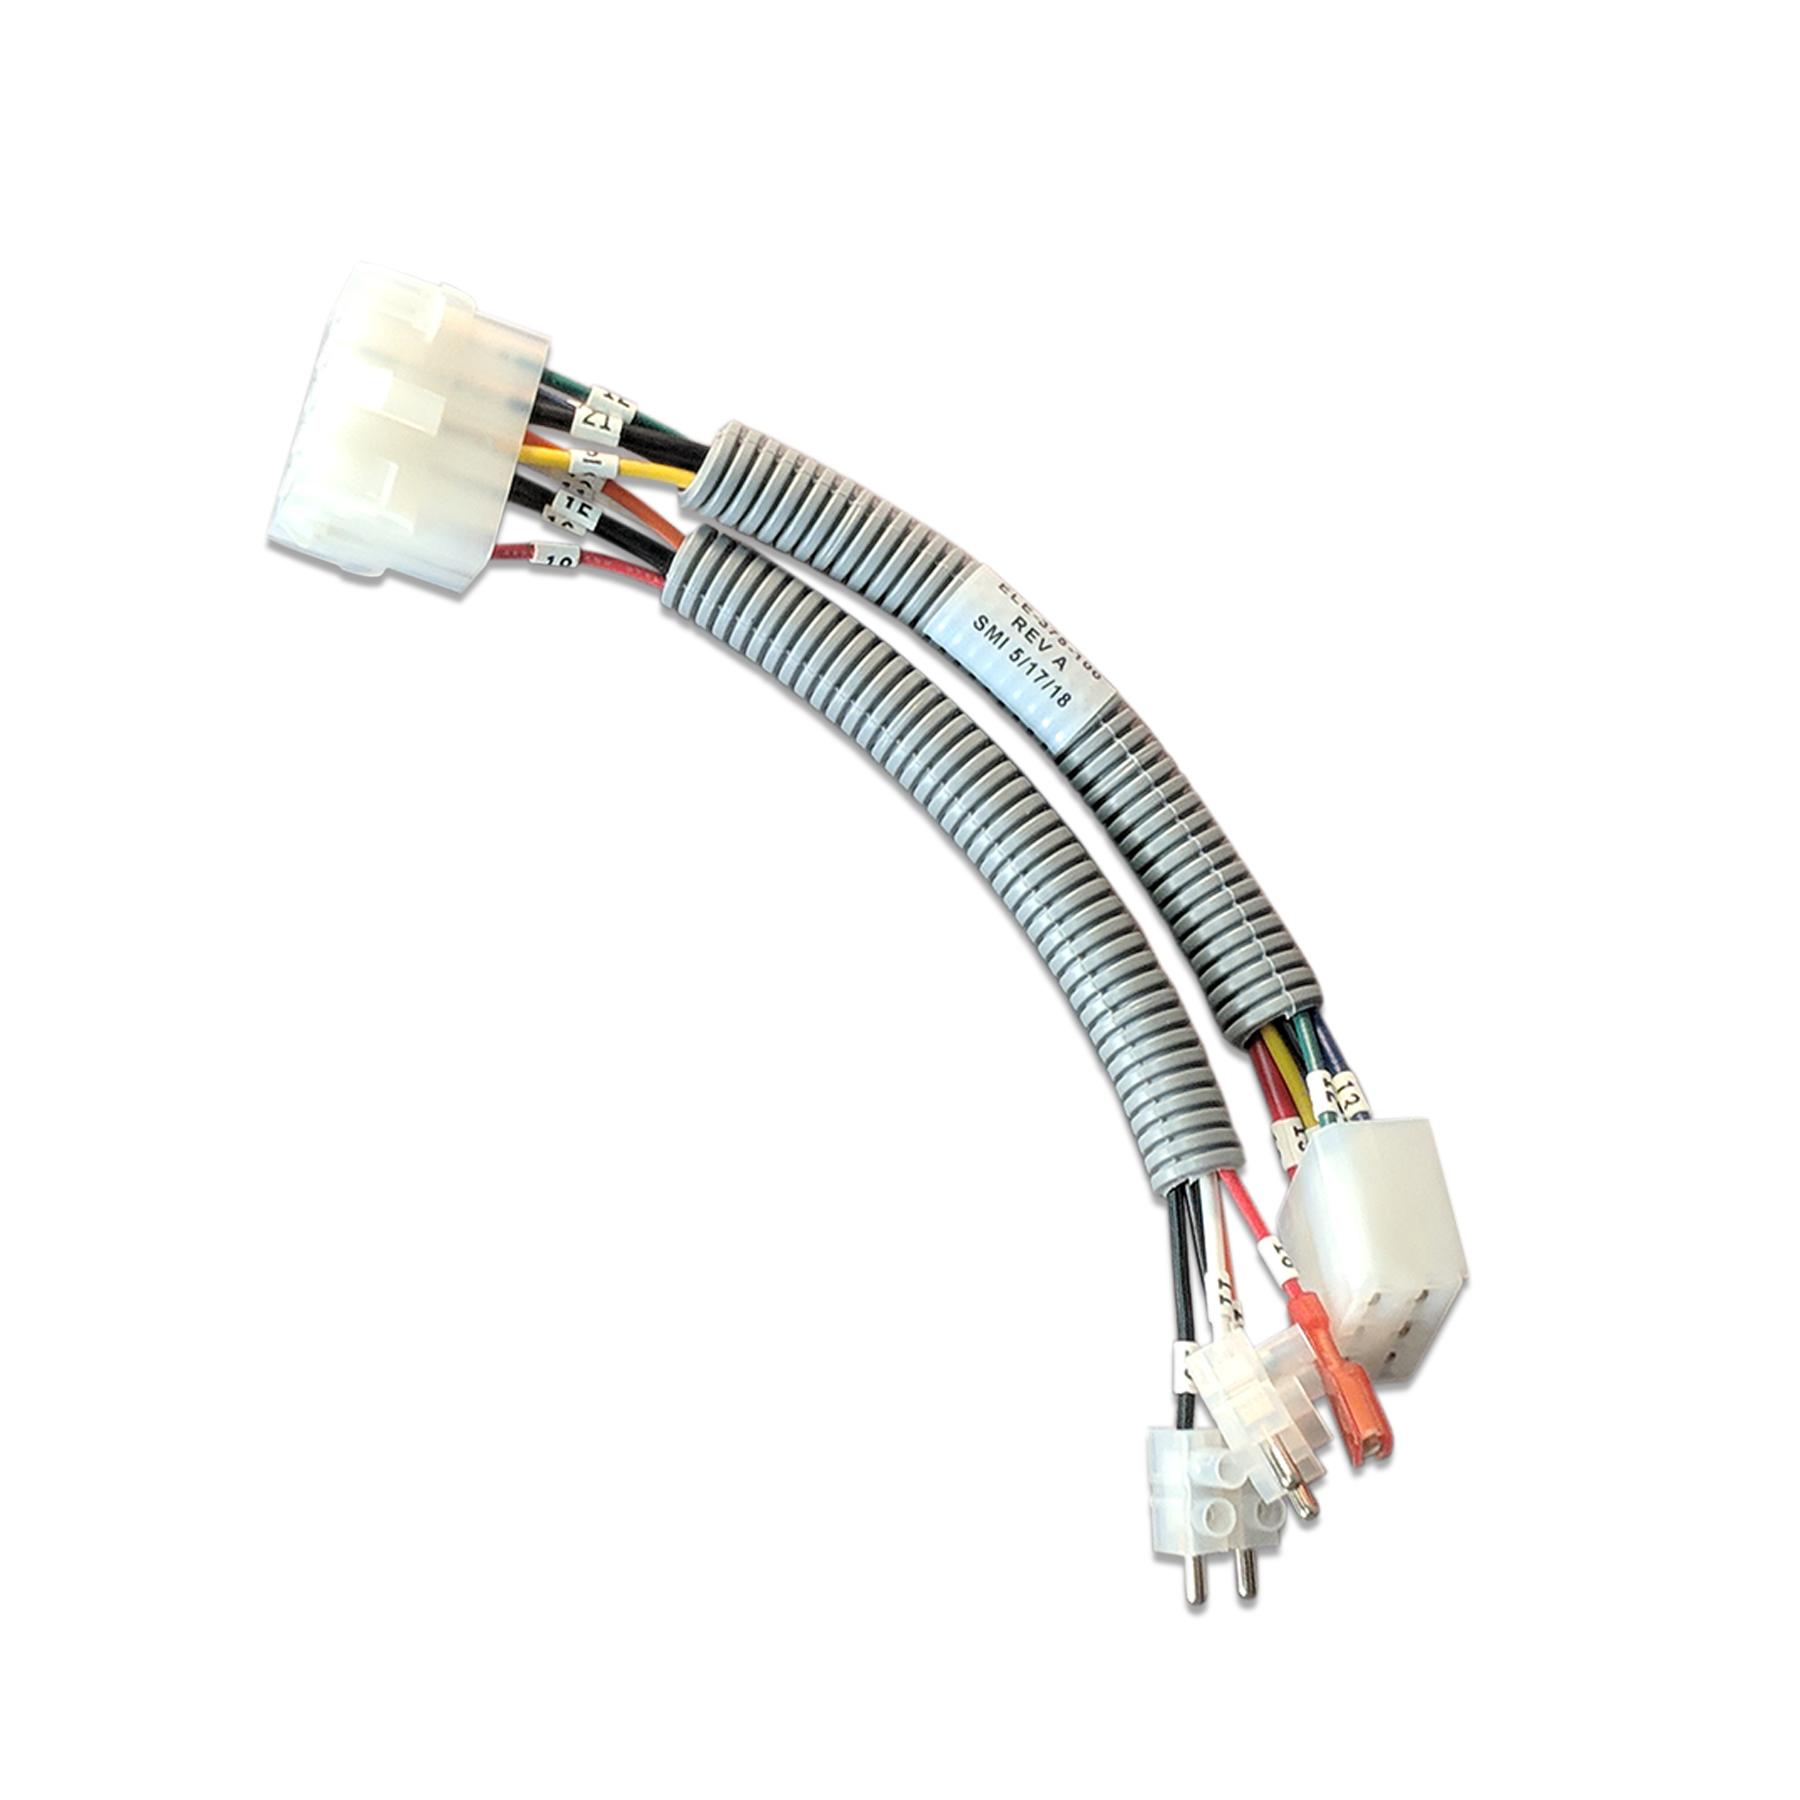 Beckett to Webasto Burner Wiring Harness, 375D